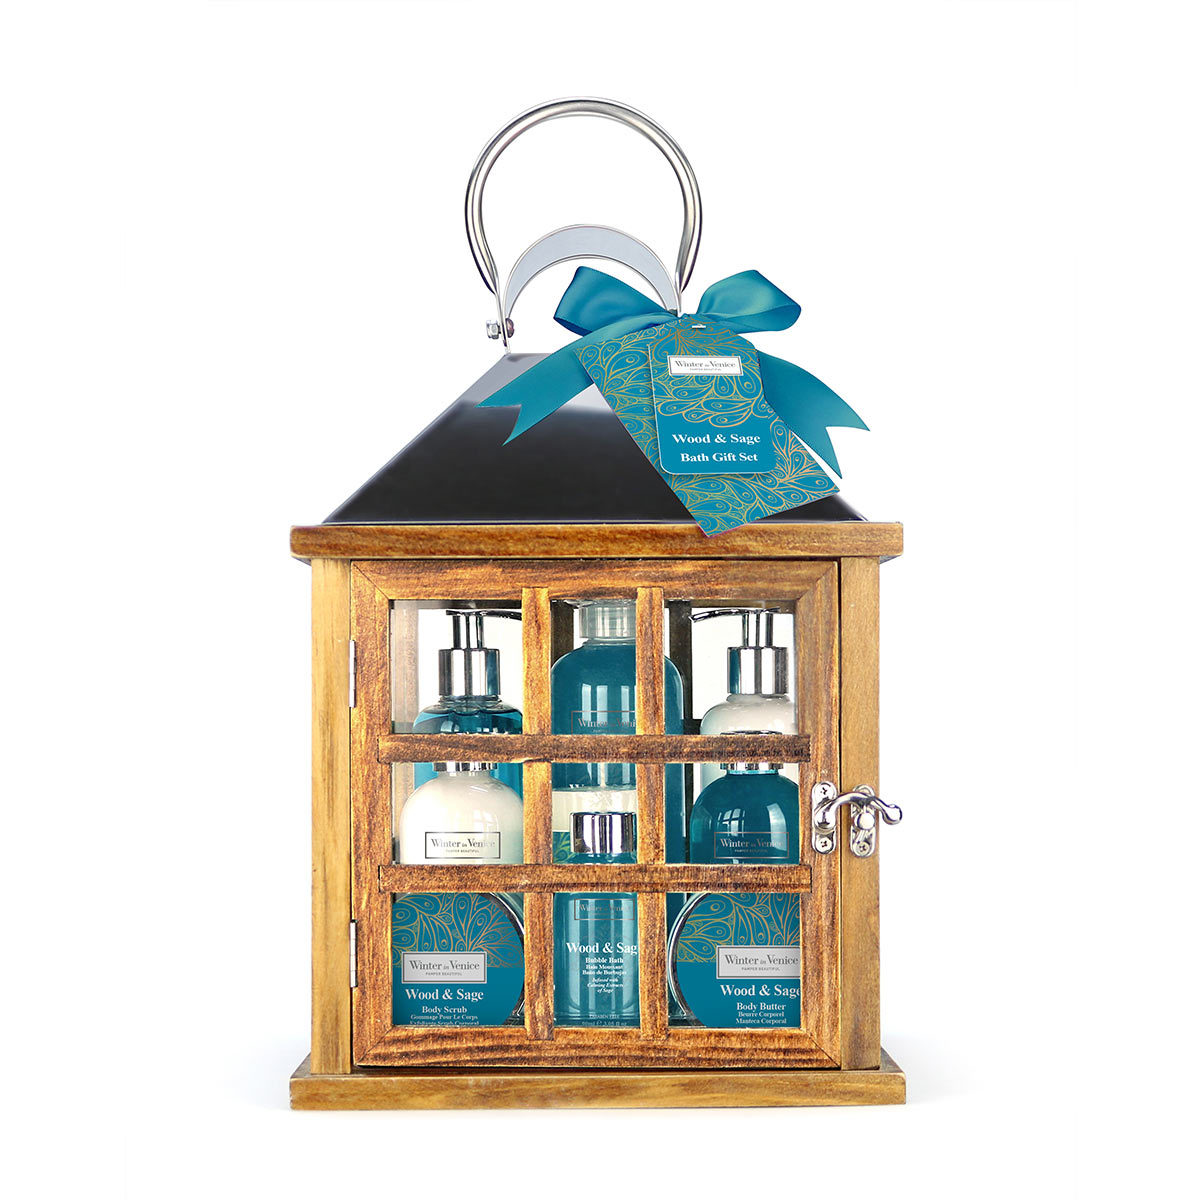 Winter in Venice Lantern Bath Gift Set - Wood & Sage  Costco UK